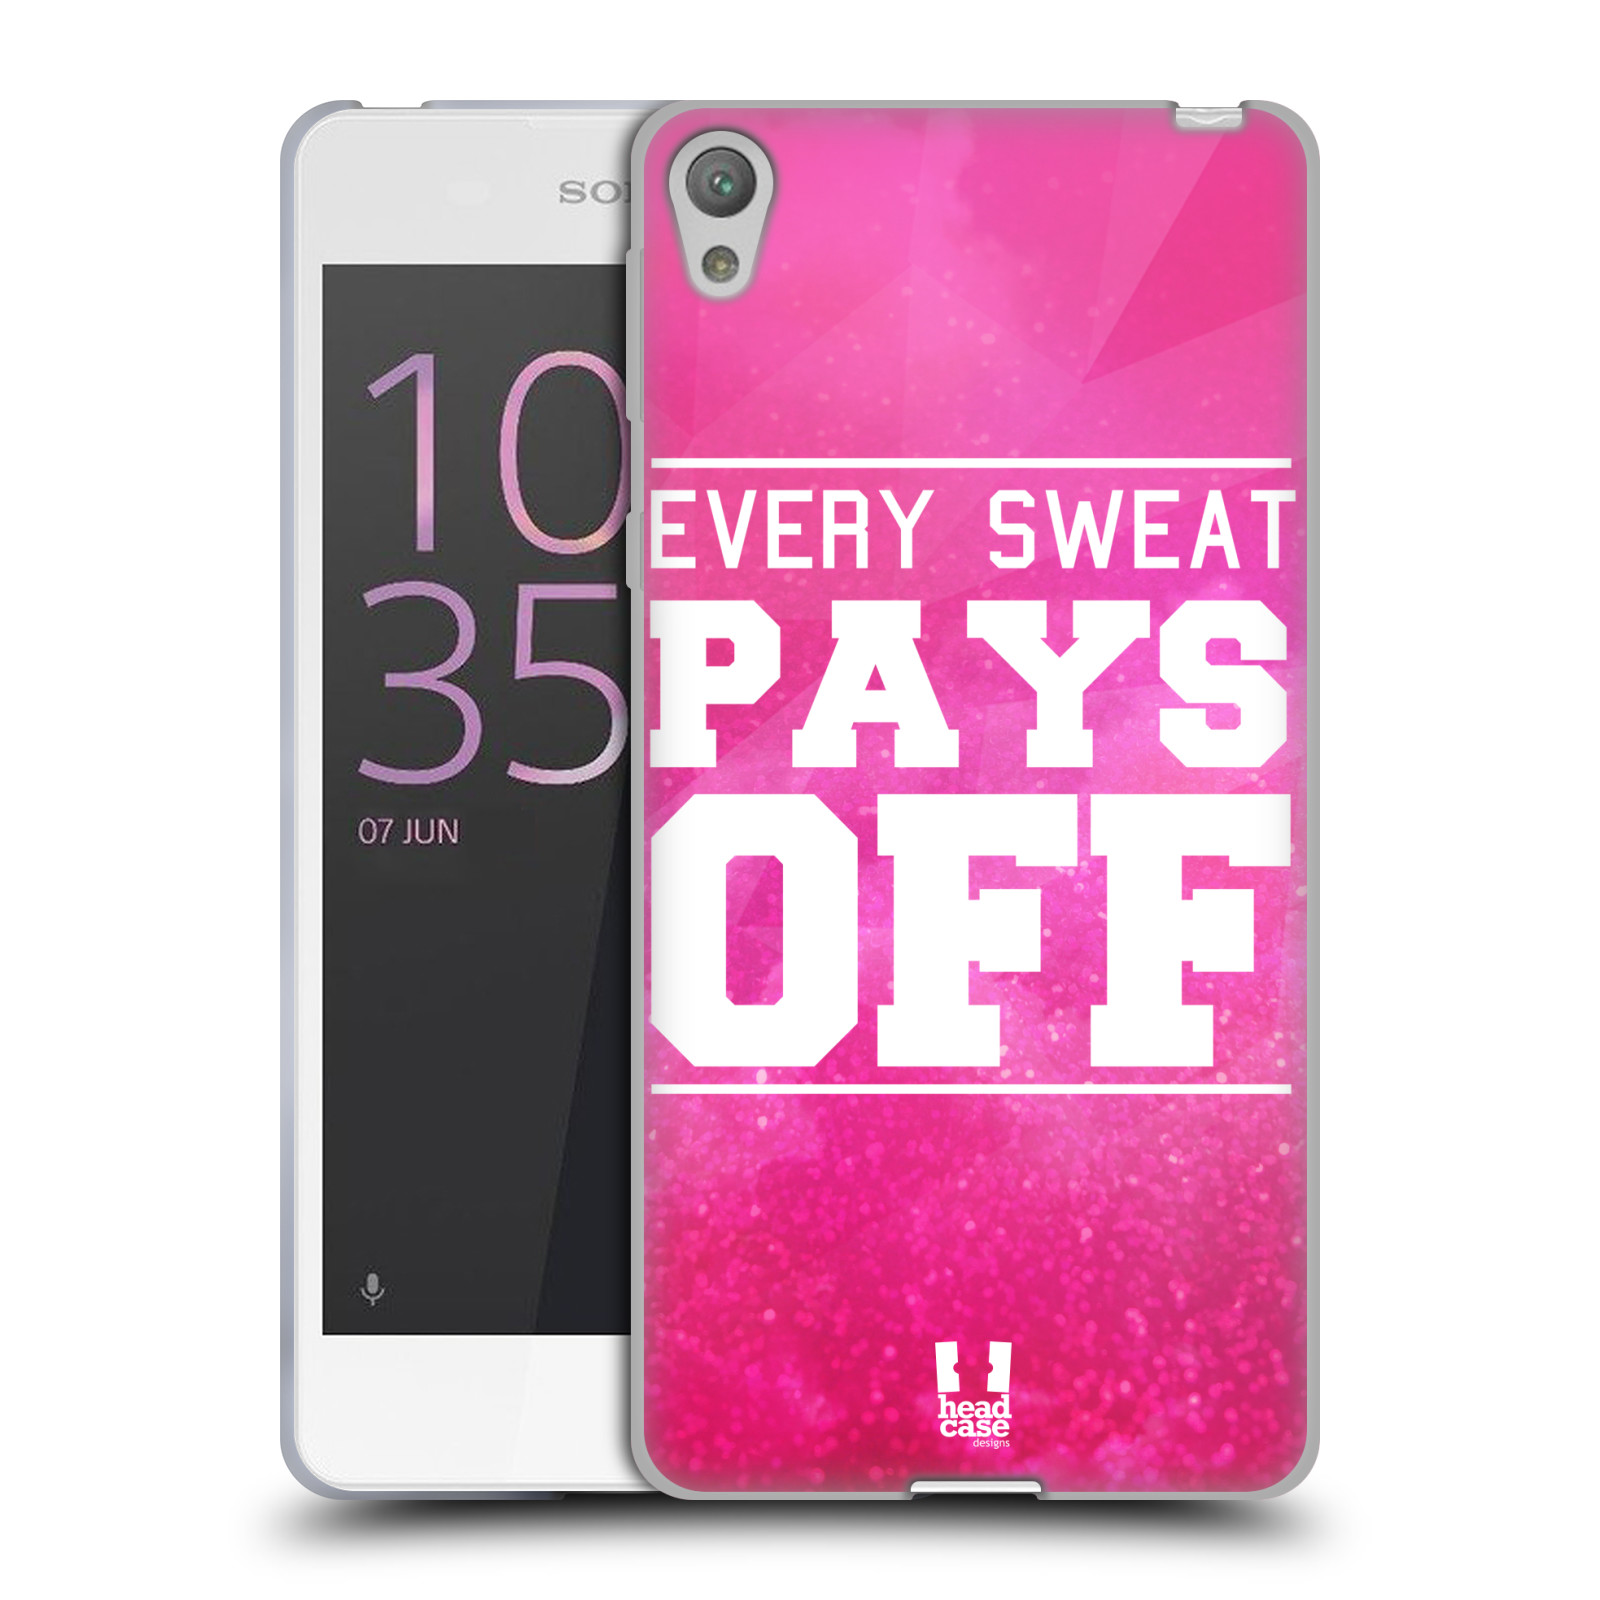 HEAD CASE silikonový obal na mobil Sony Xperia E5 Sportovní nápisy růžová barva POT a DŘINA